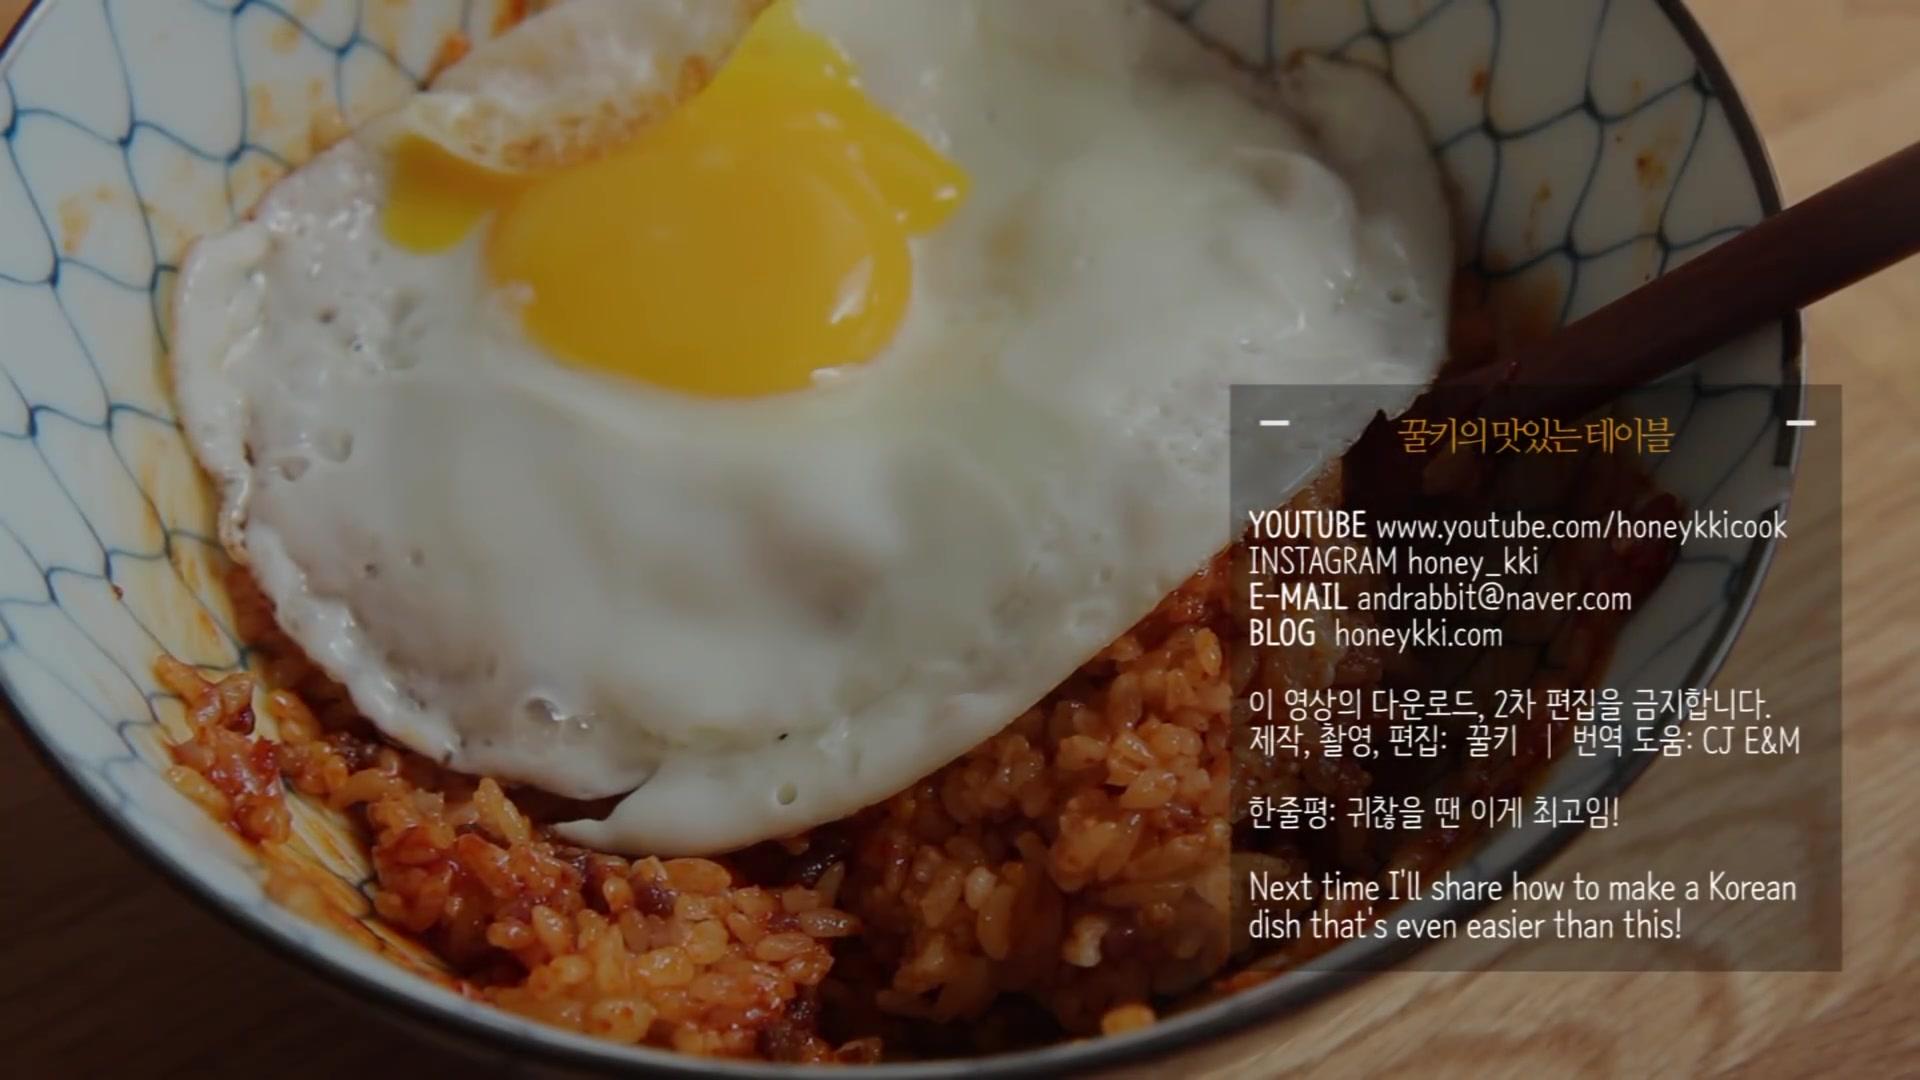 Honeykki Episode 185: Stir-Fried Gochujang (Red Chili Paste)